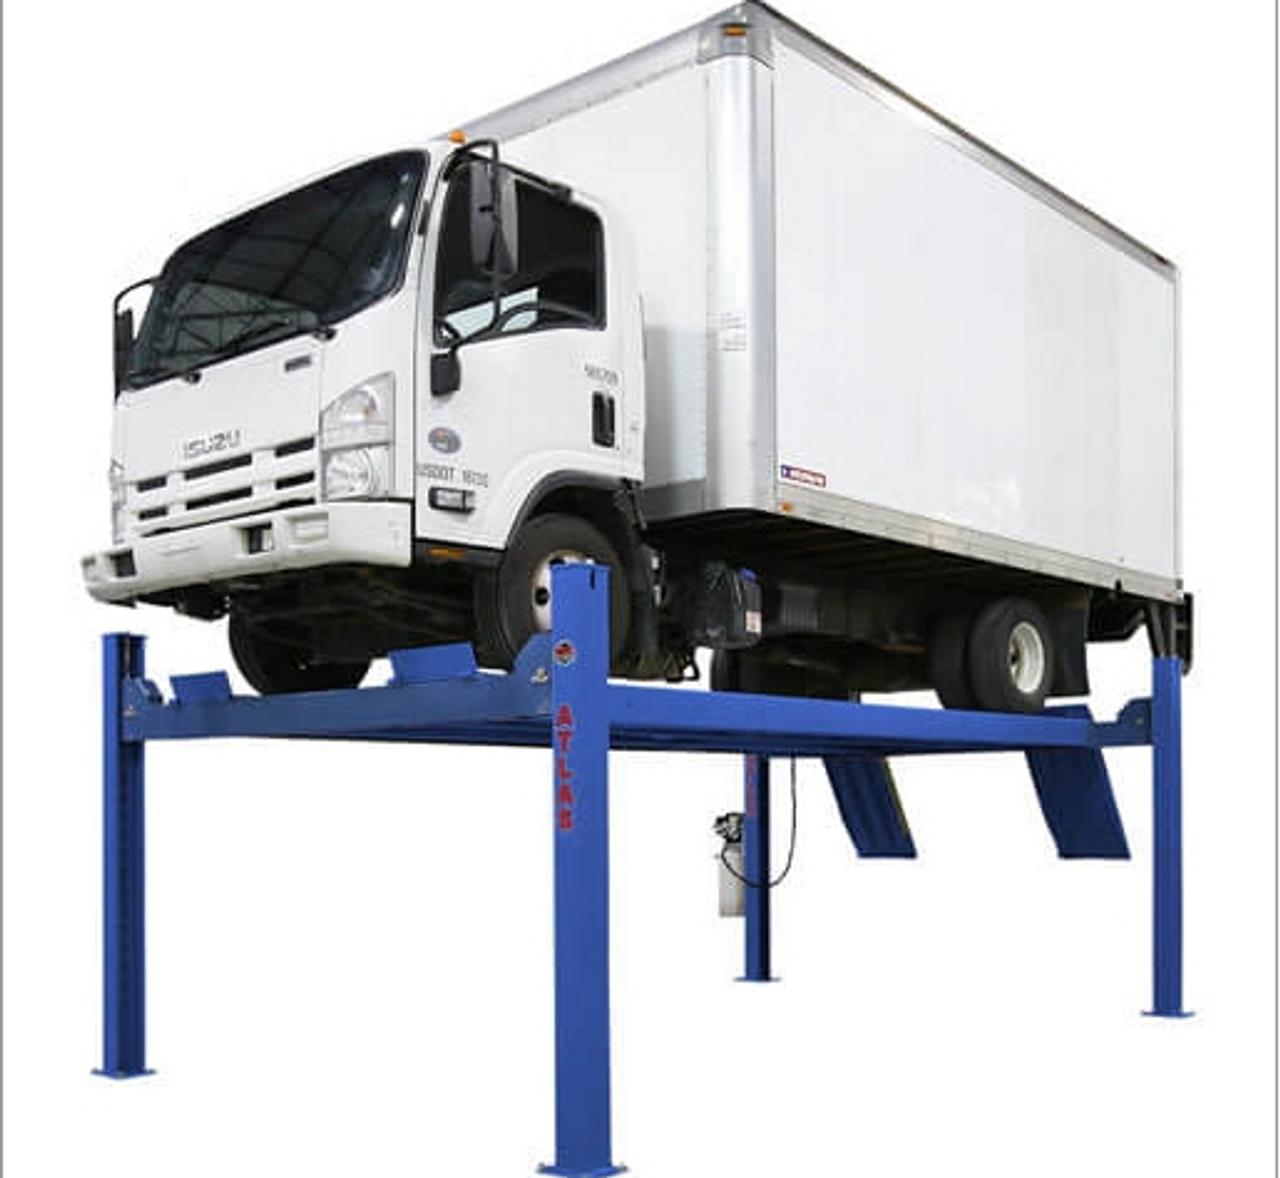 Atlas® Platinum AP-PVL14 ALI Certified 4 Post Lift 14,000 lbs